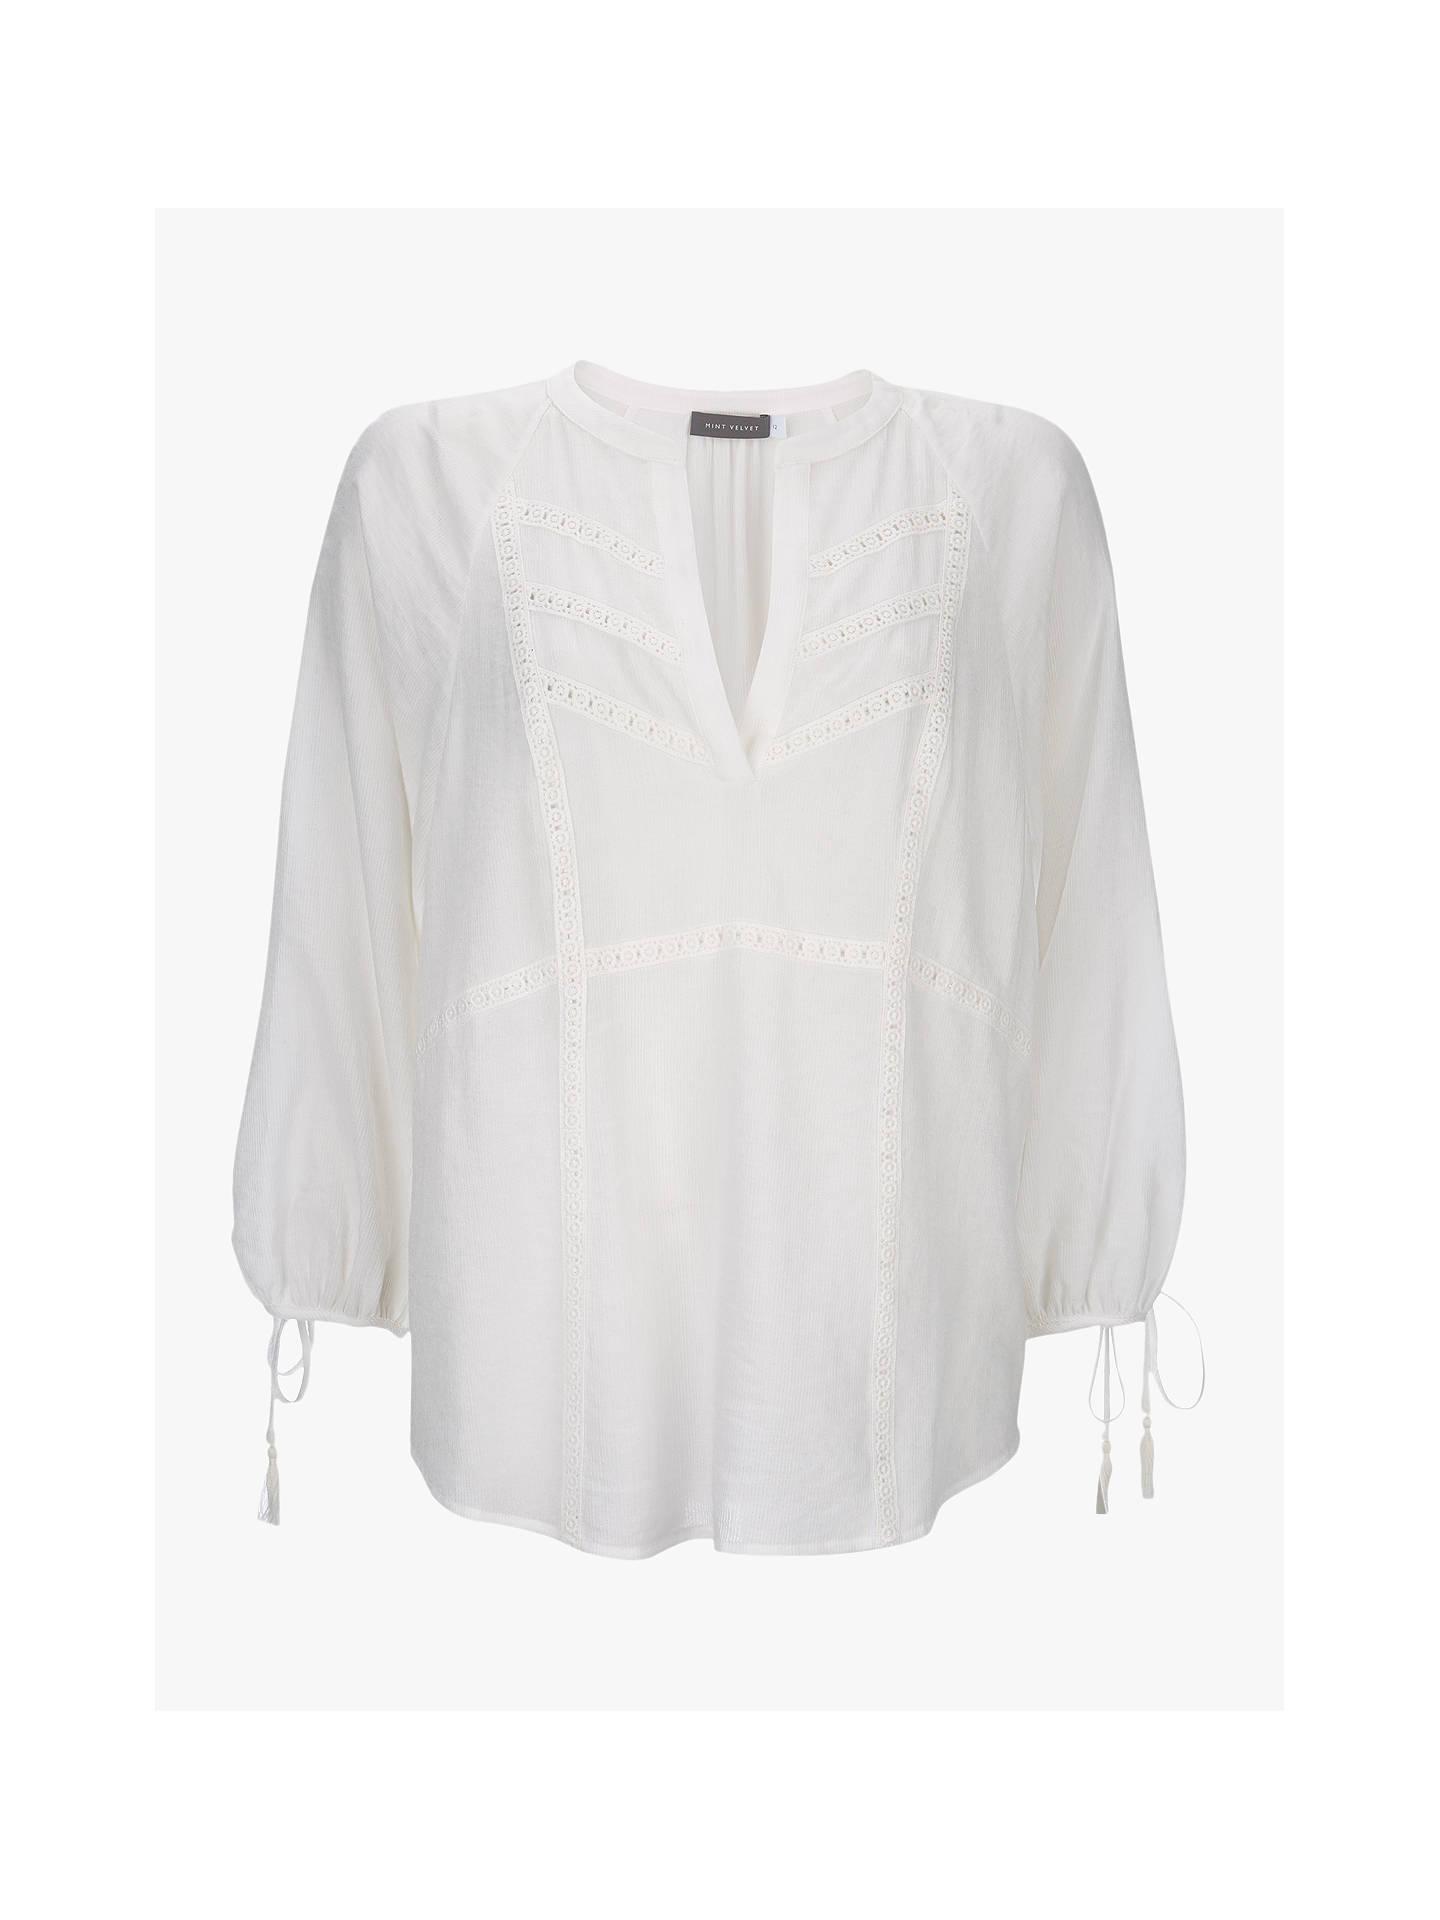 bc06e2c44736 Buy Mint Velvet Lace Boho Top, Ivory, 18 Online at johnlewis.com ...